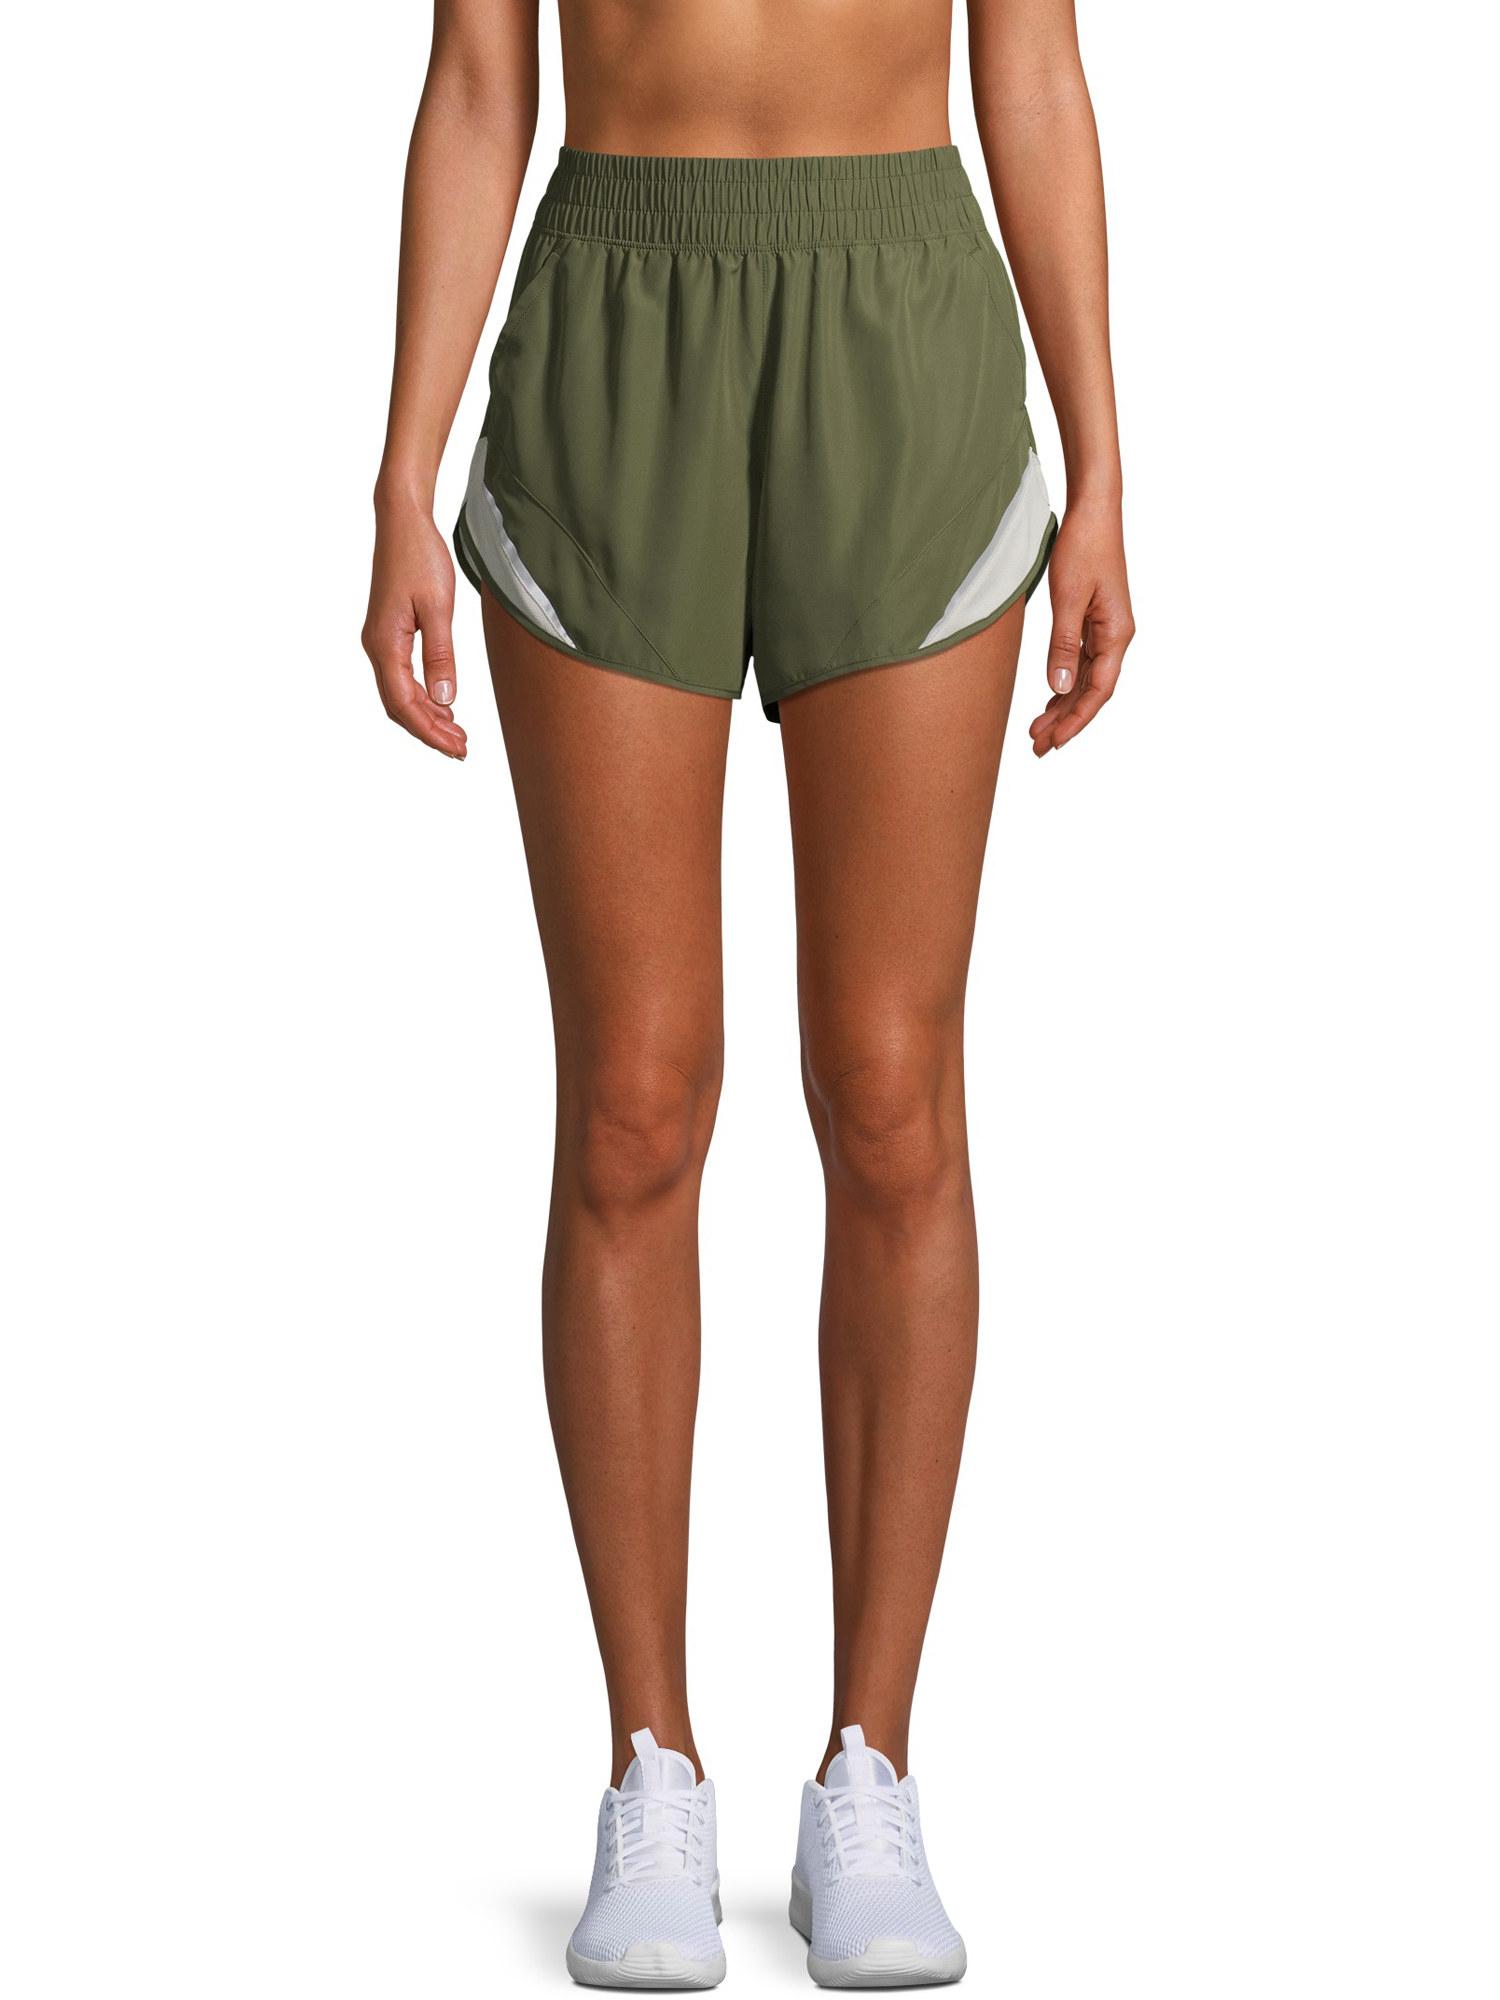 model wearing olive green running shorts